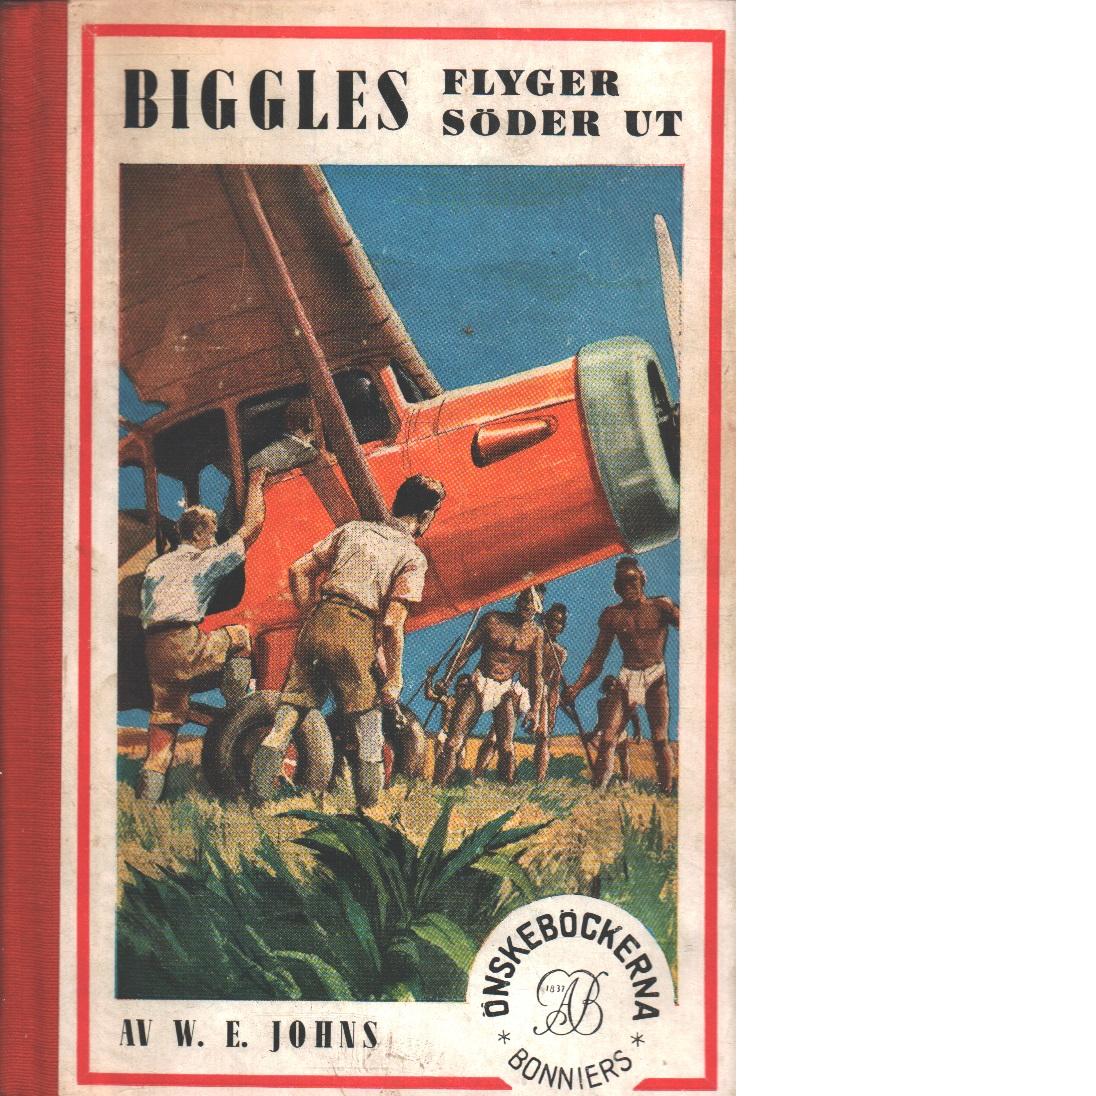 Biggles flyger söderut - Johns, William Earl